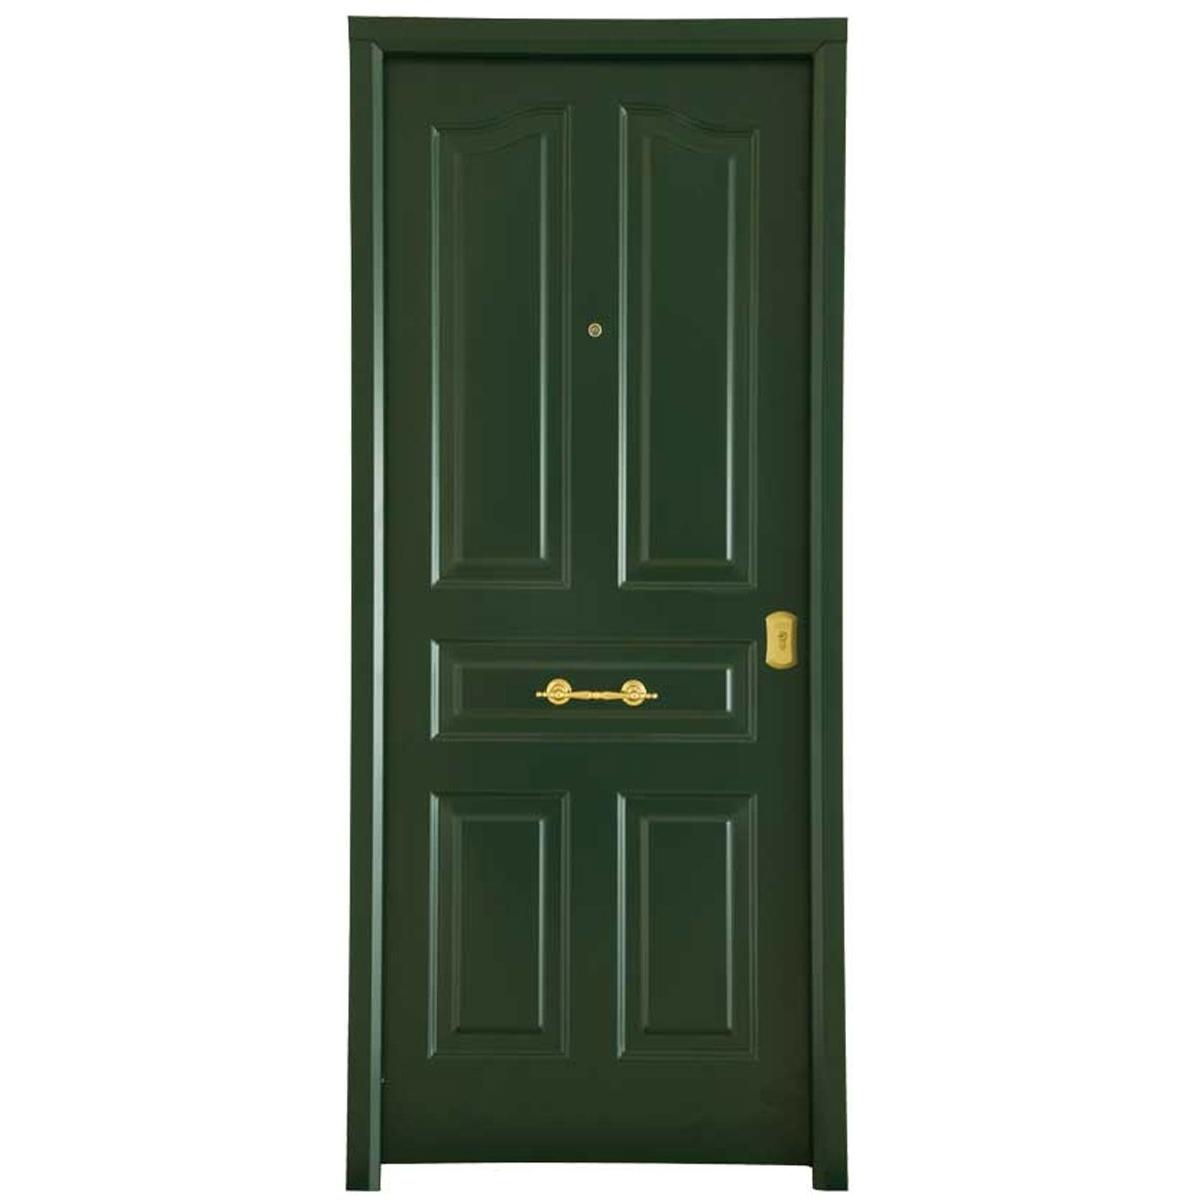 Puerta acorazada Antique Verde - Puertas acorazadas Serie B4-BL